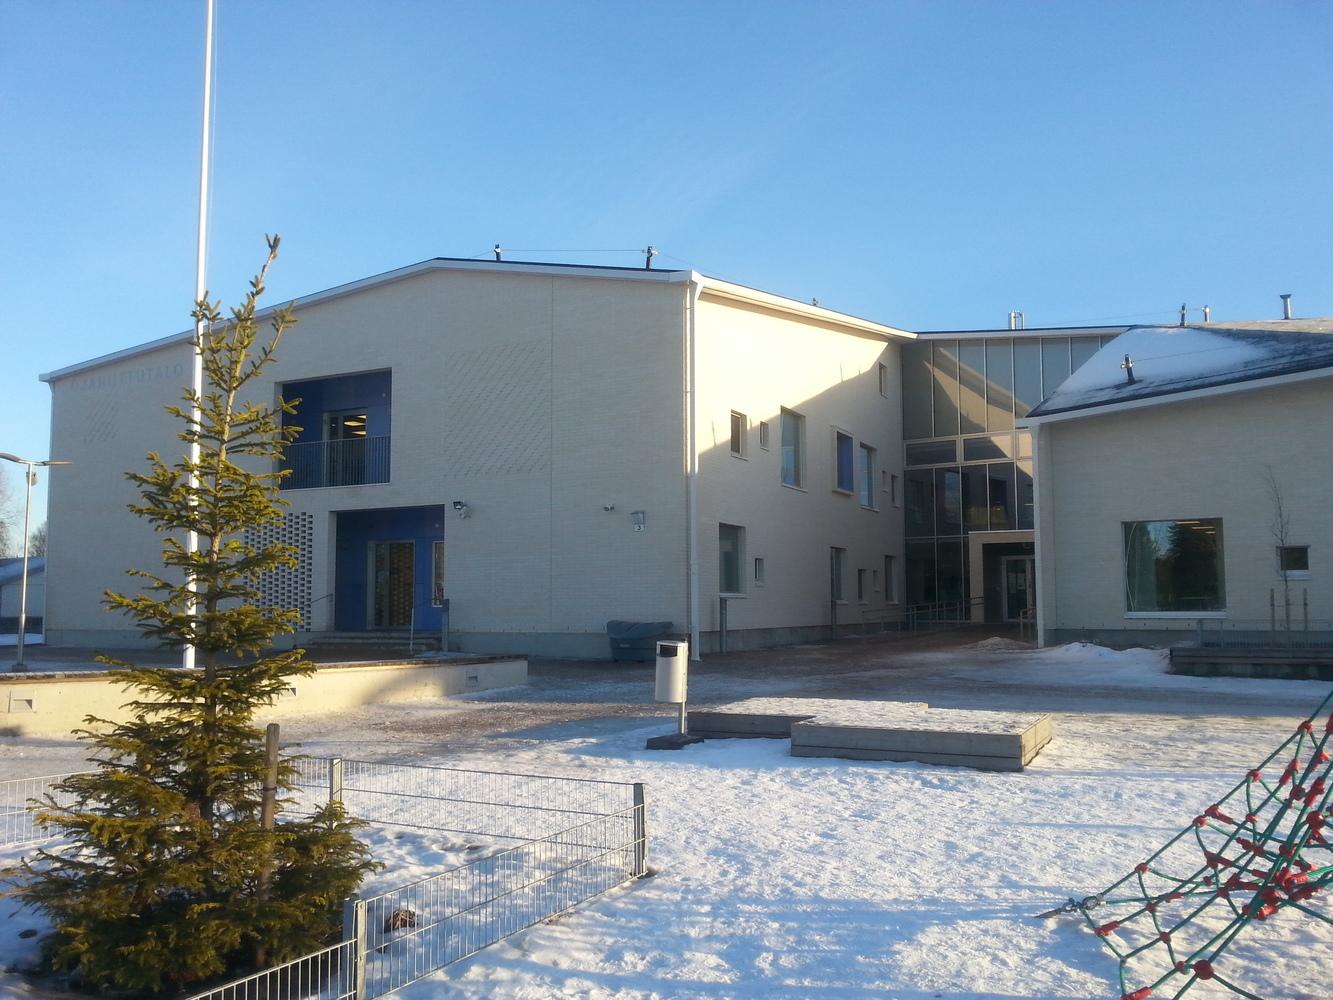 Lojo, Ojaniittuhusets bibliotek